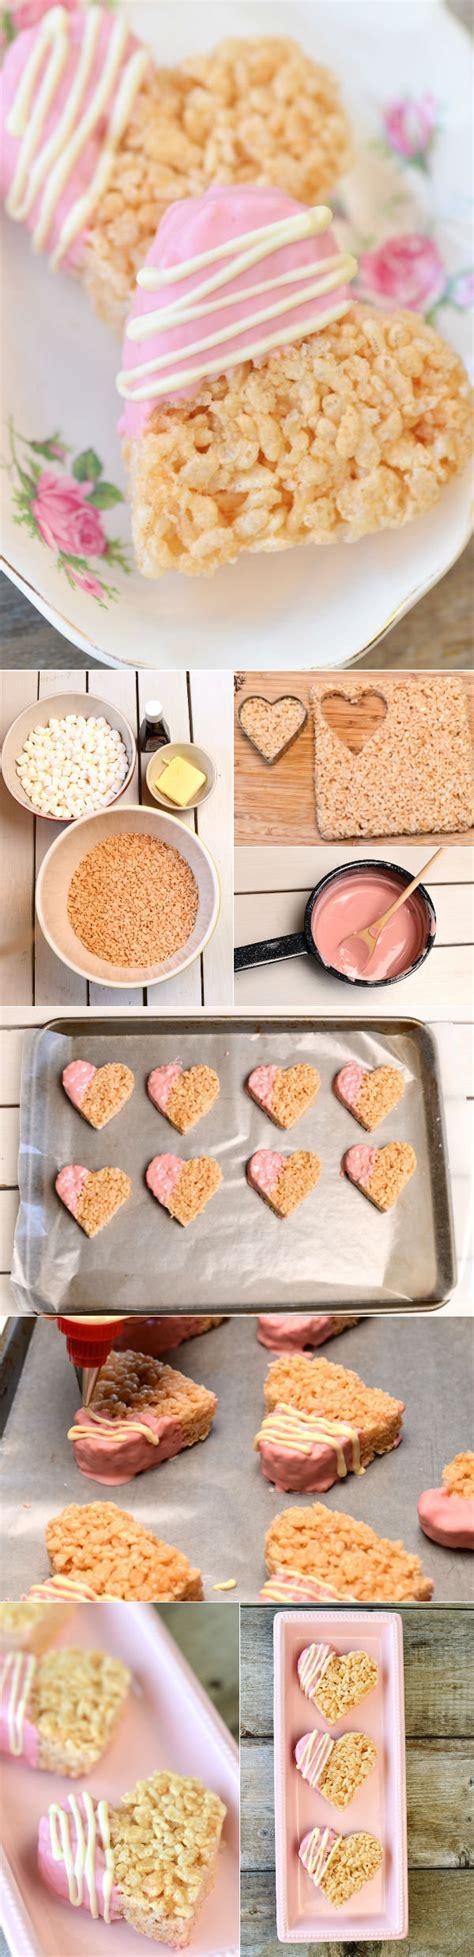 easy edible wedding favor ideas 15 budget friendly diy wedding favors tulle chantilly